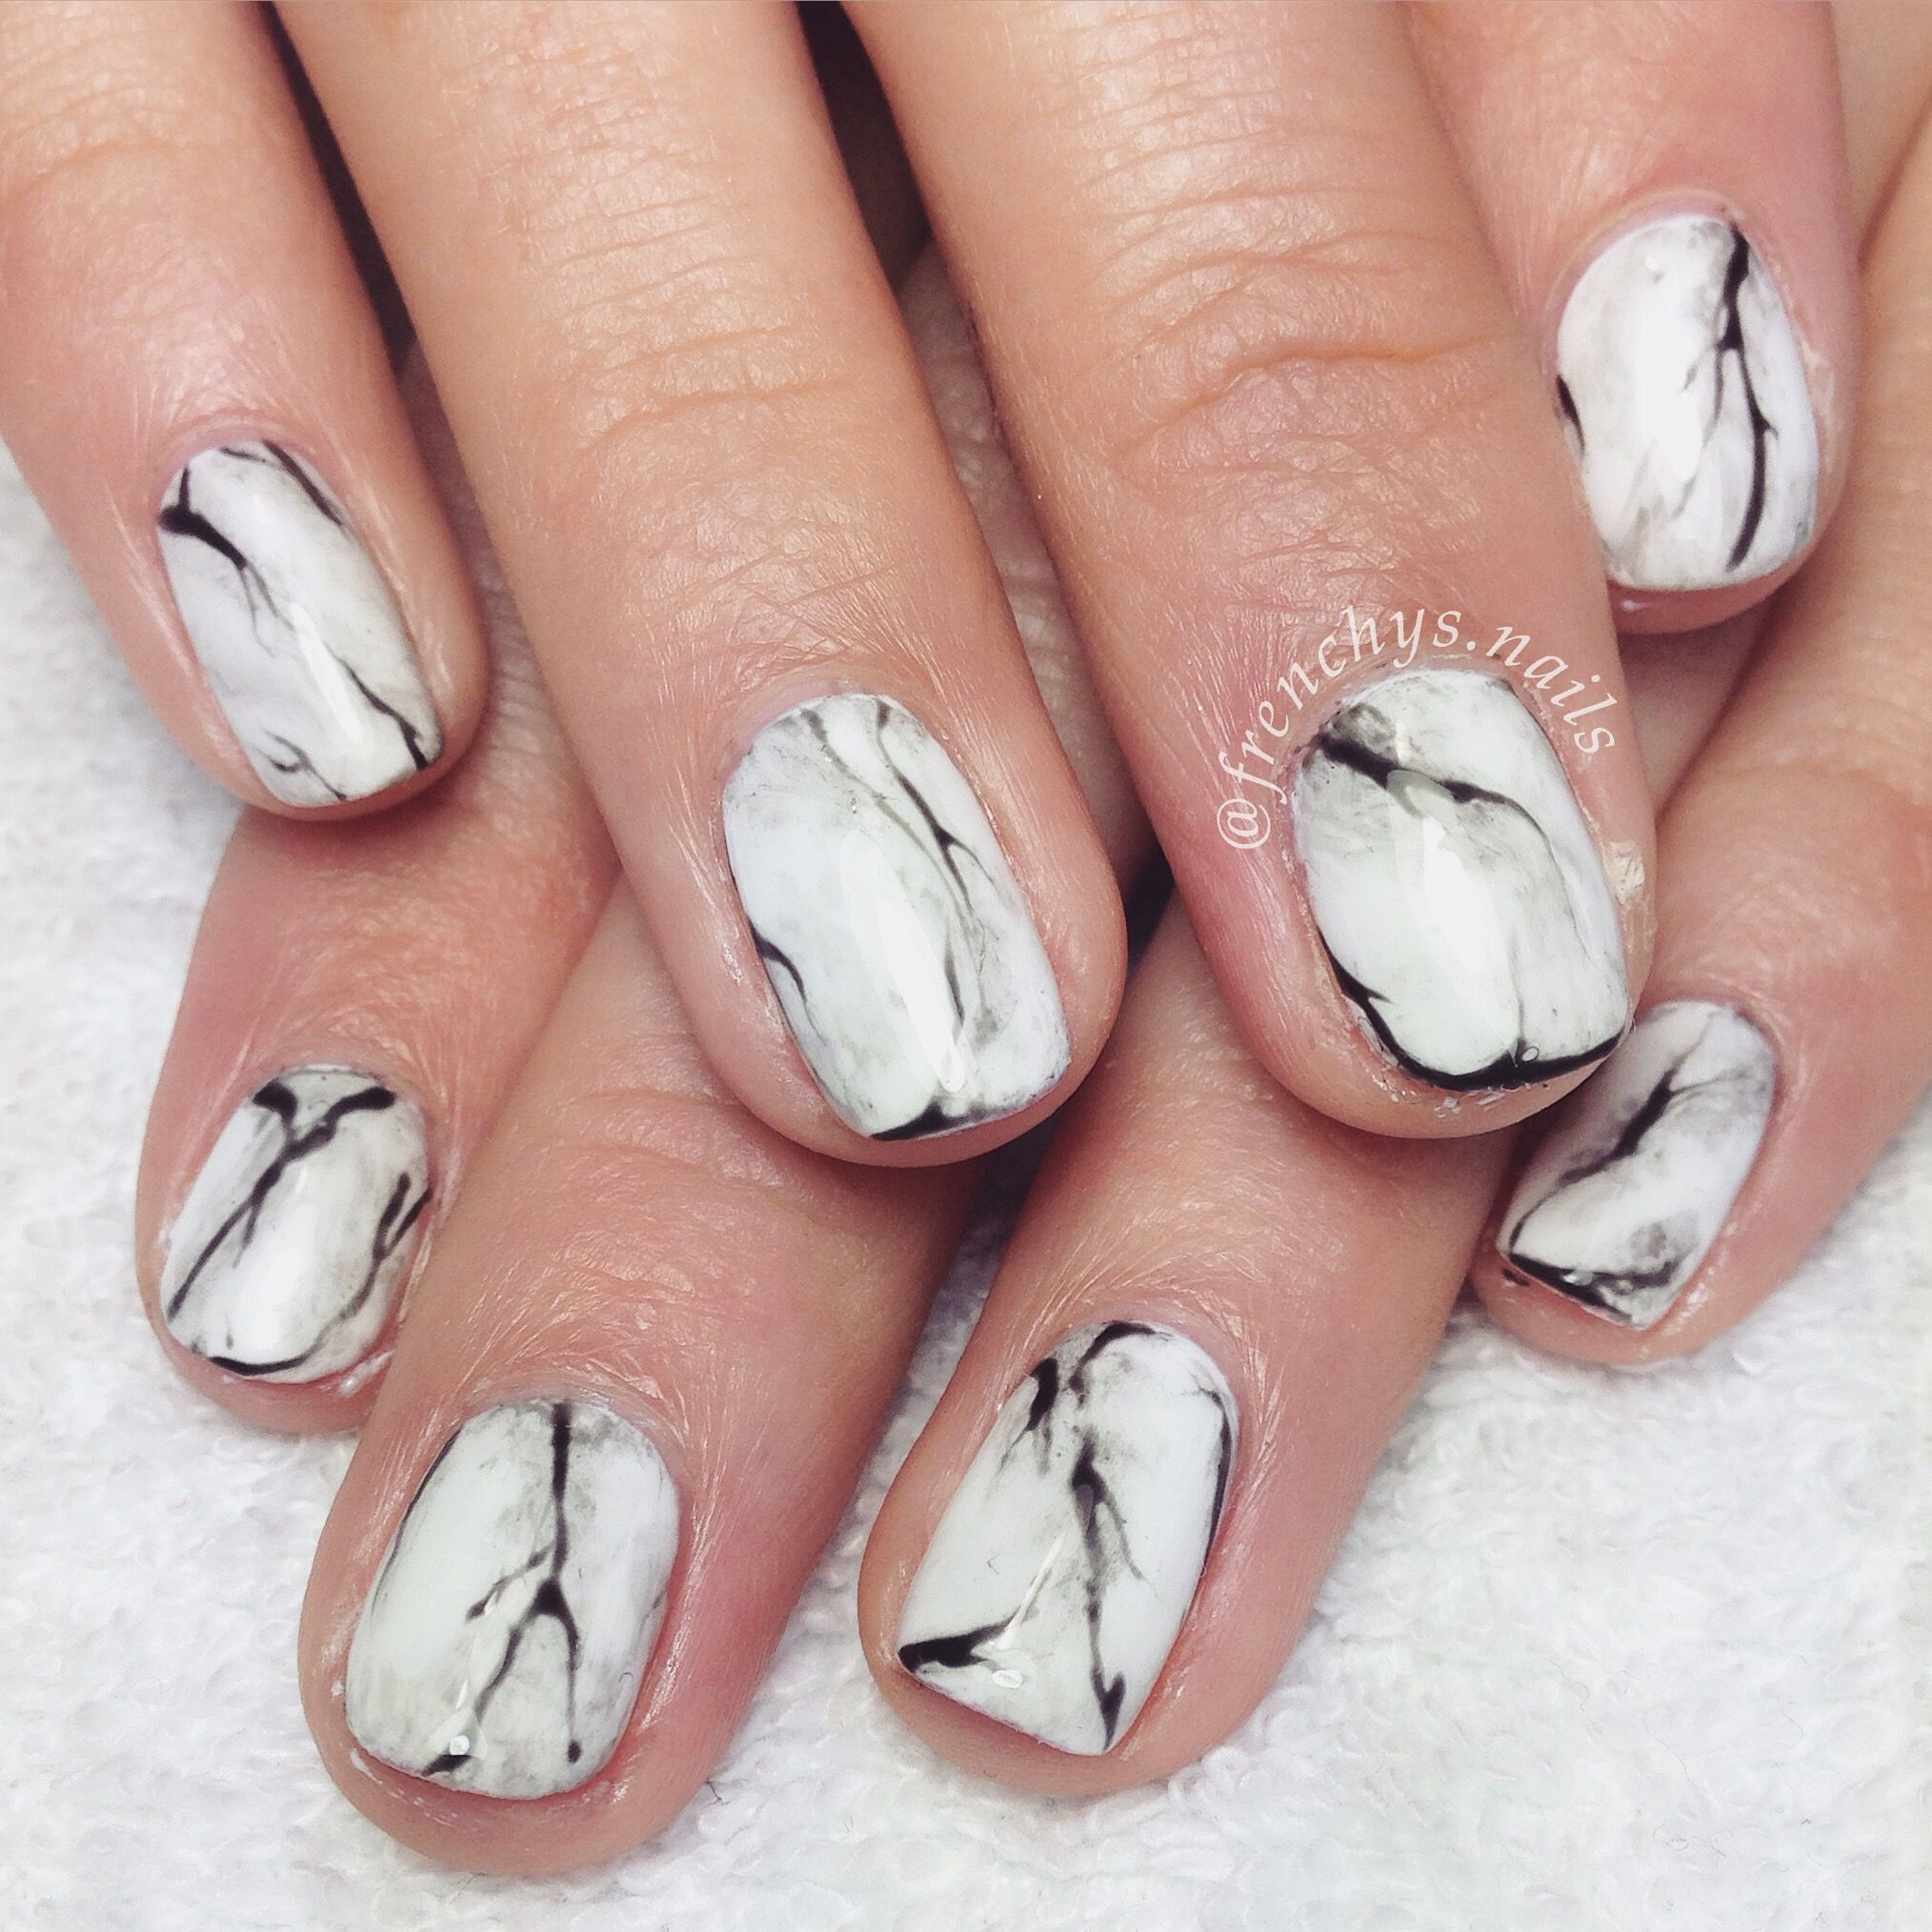 Marble effect nails using Gelish gelpolish ...